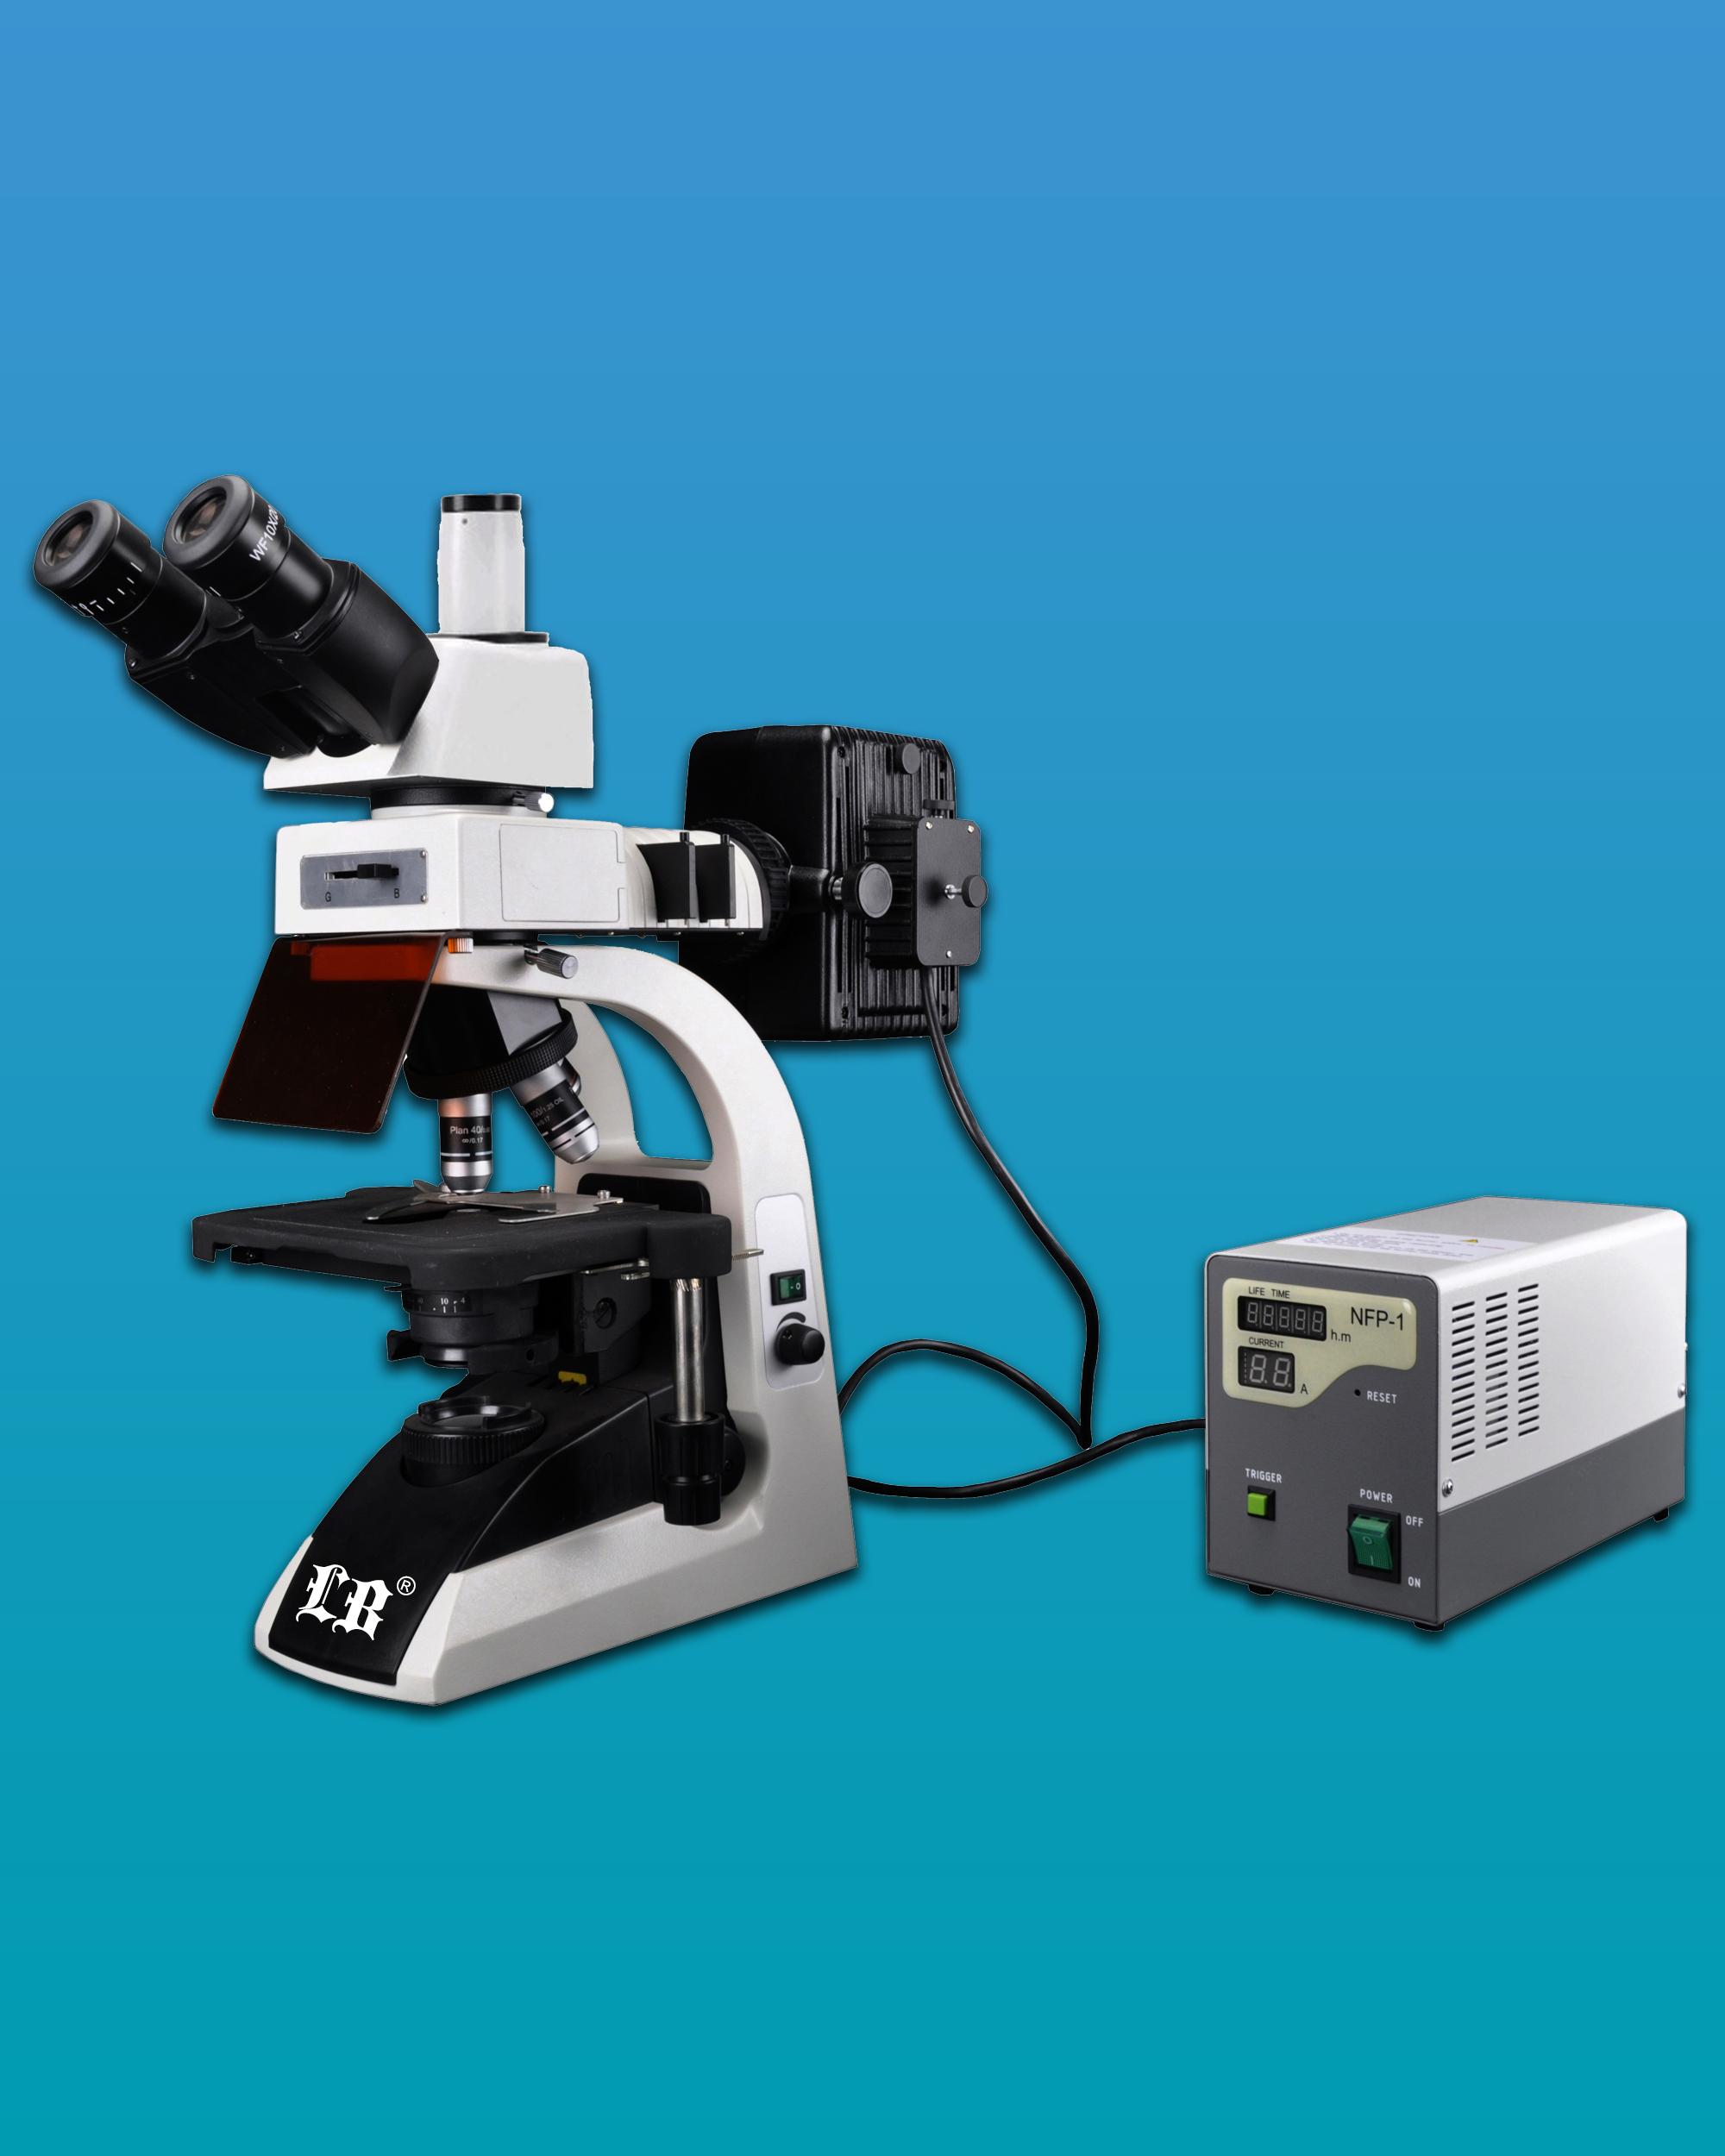 [LB-279] Fluorescent Trinocular Biological Microscope  w/ Infinite Optical System & Extra Wide Field